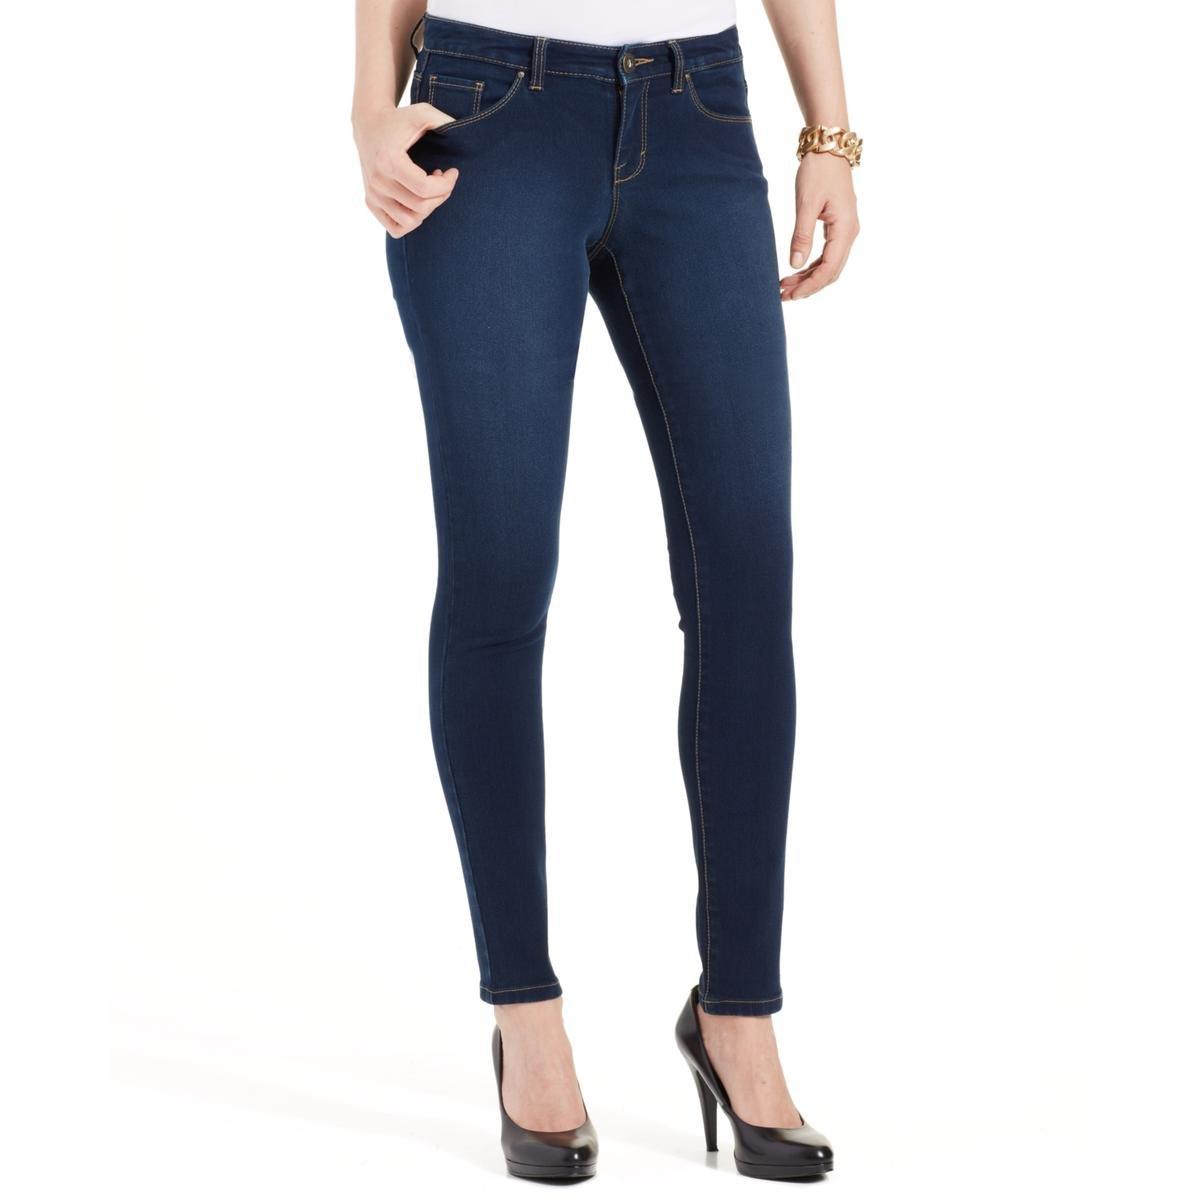 Style & Co.. Womens Petites Curvy Fit Tummy Control Ankle Pants Blue 4P